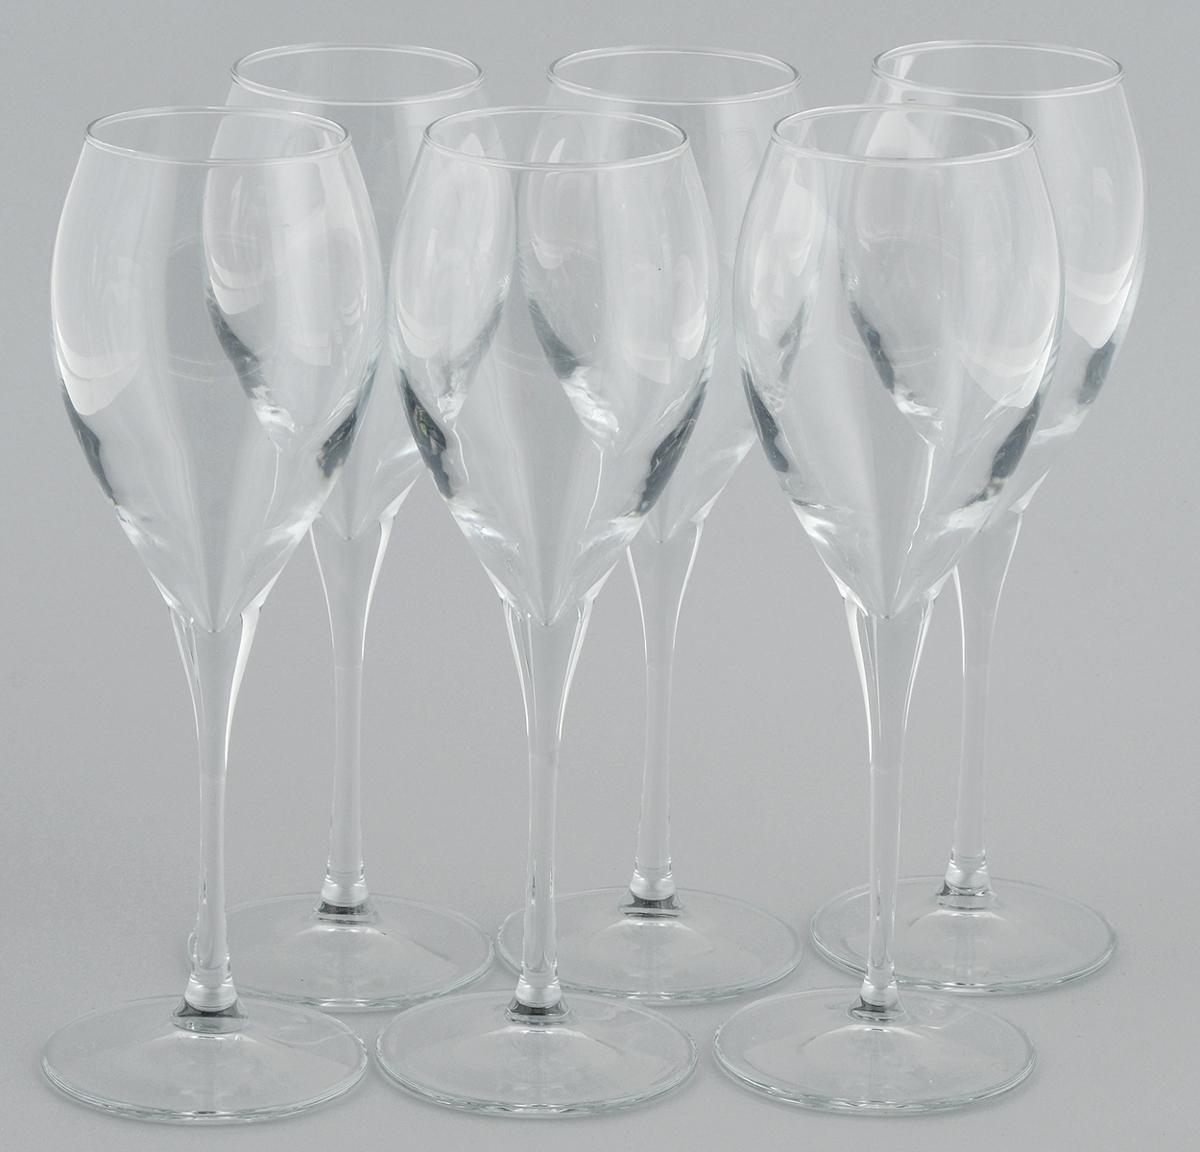 Набор бокалов Pasabahce Монте Карло, 325 мл, 6 шт440091BНабор бокалов для вина 6 штV=325 мл